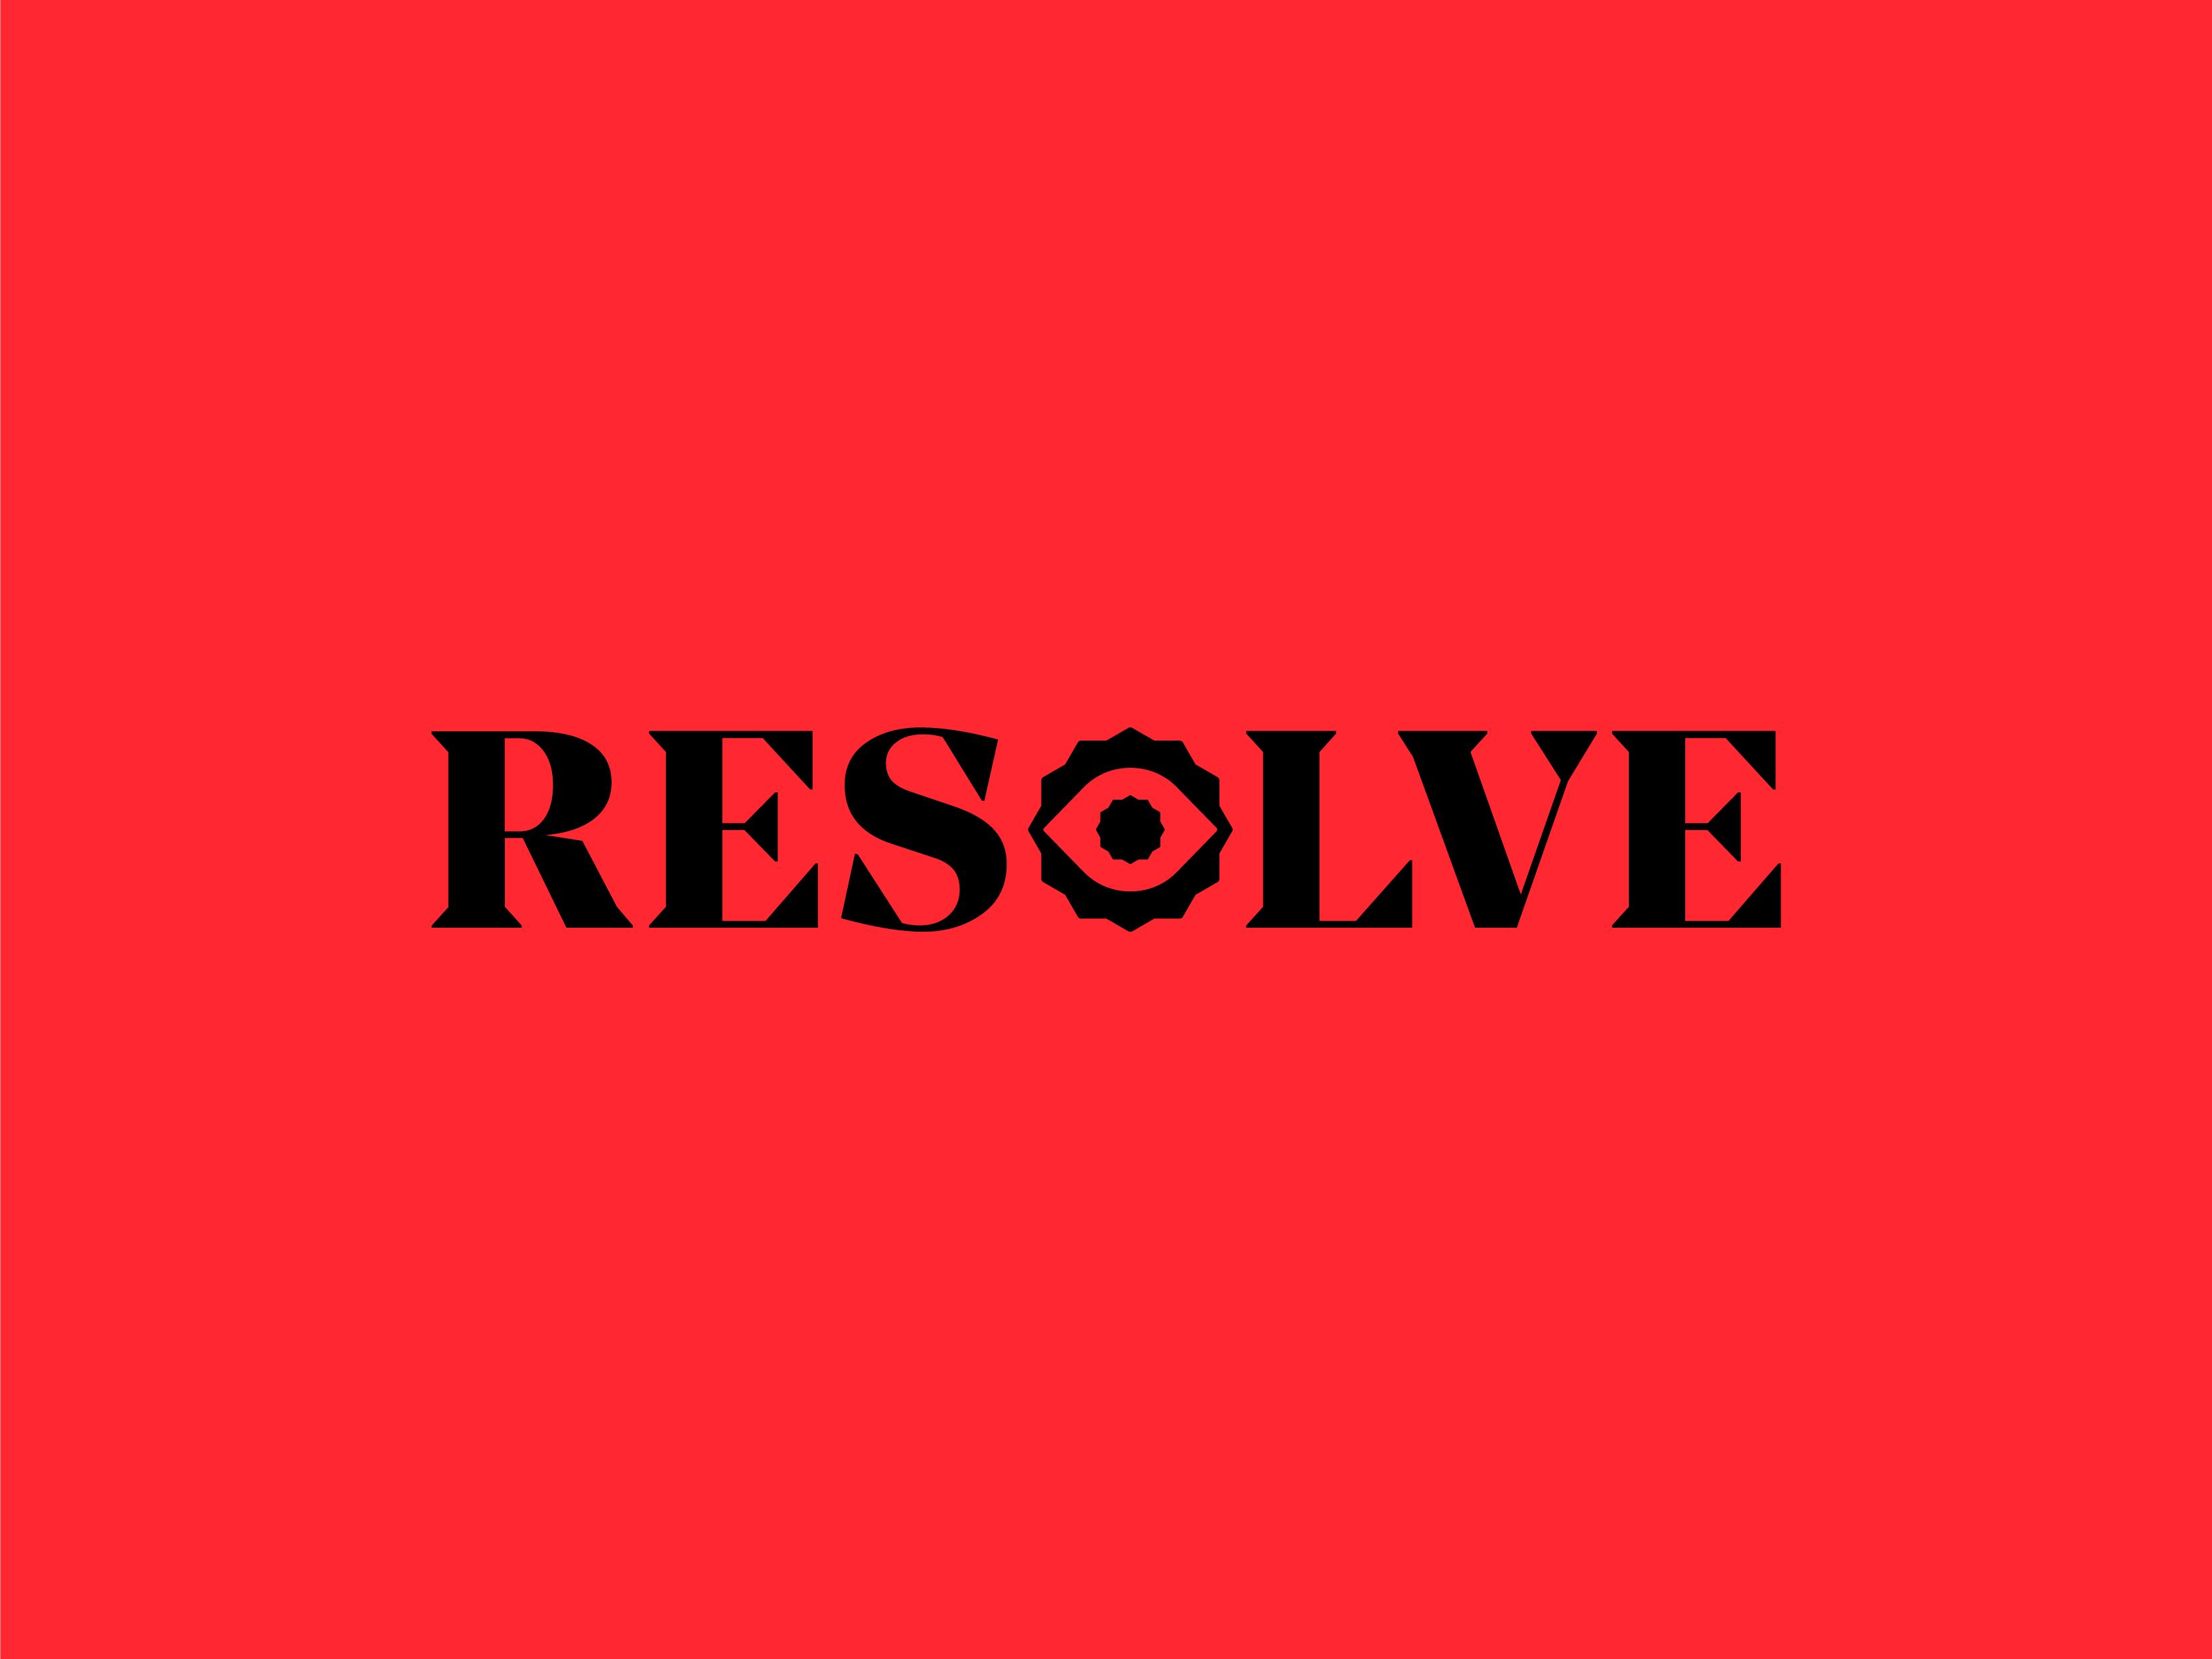 Resolve logo red